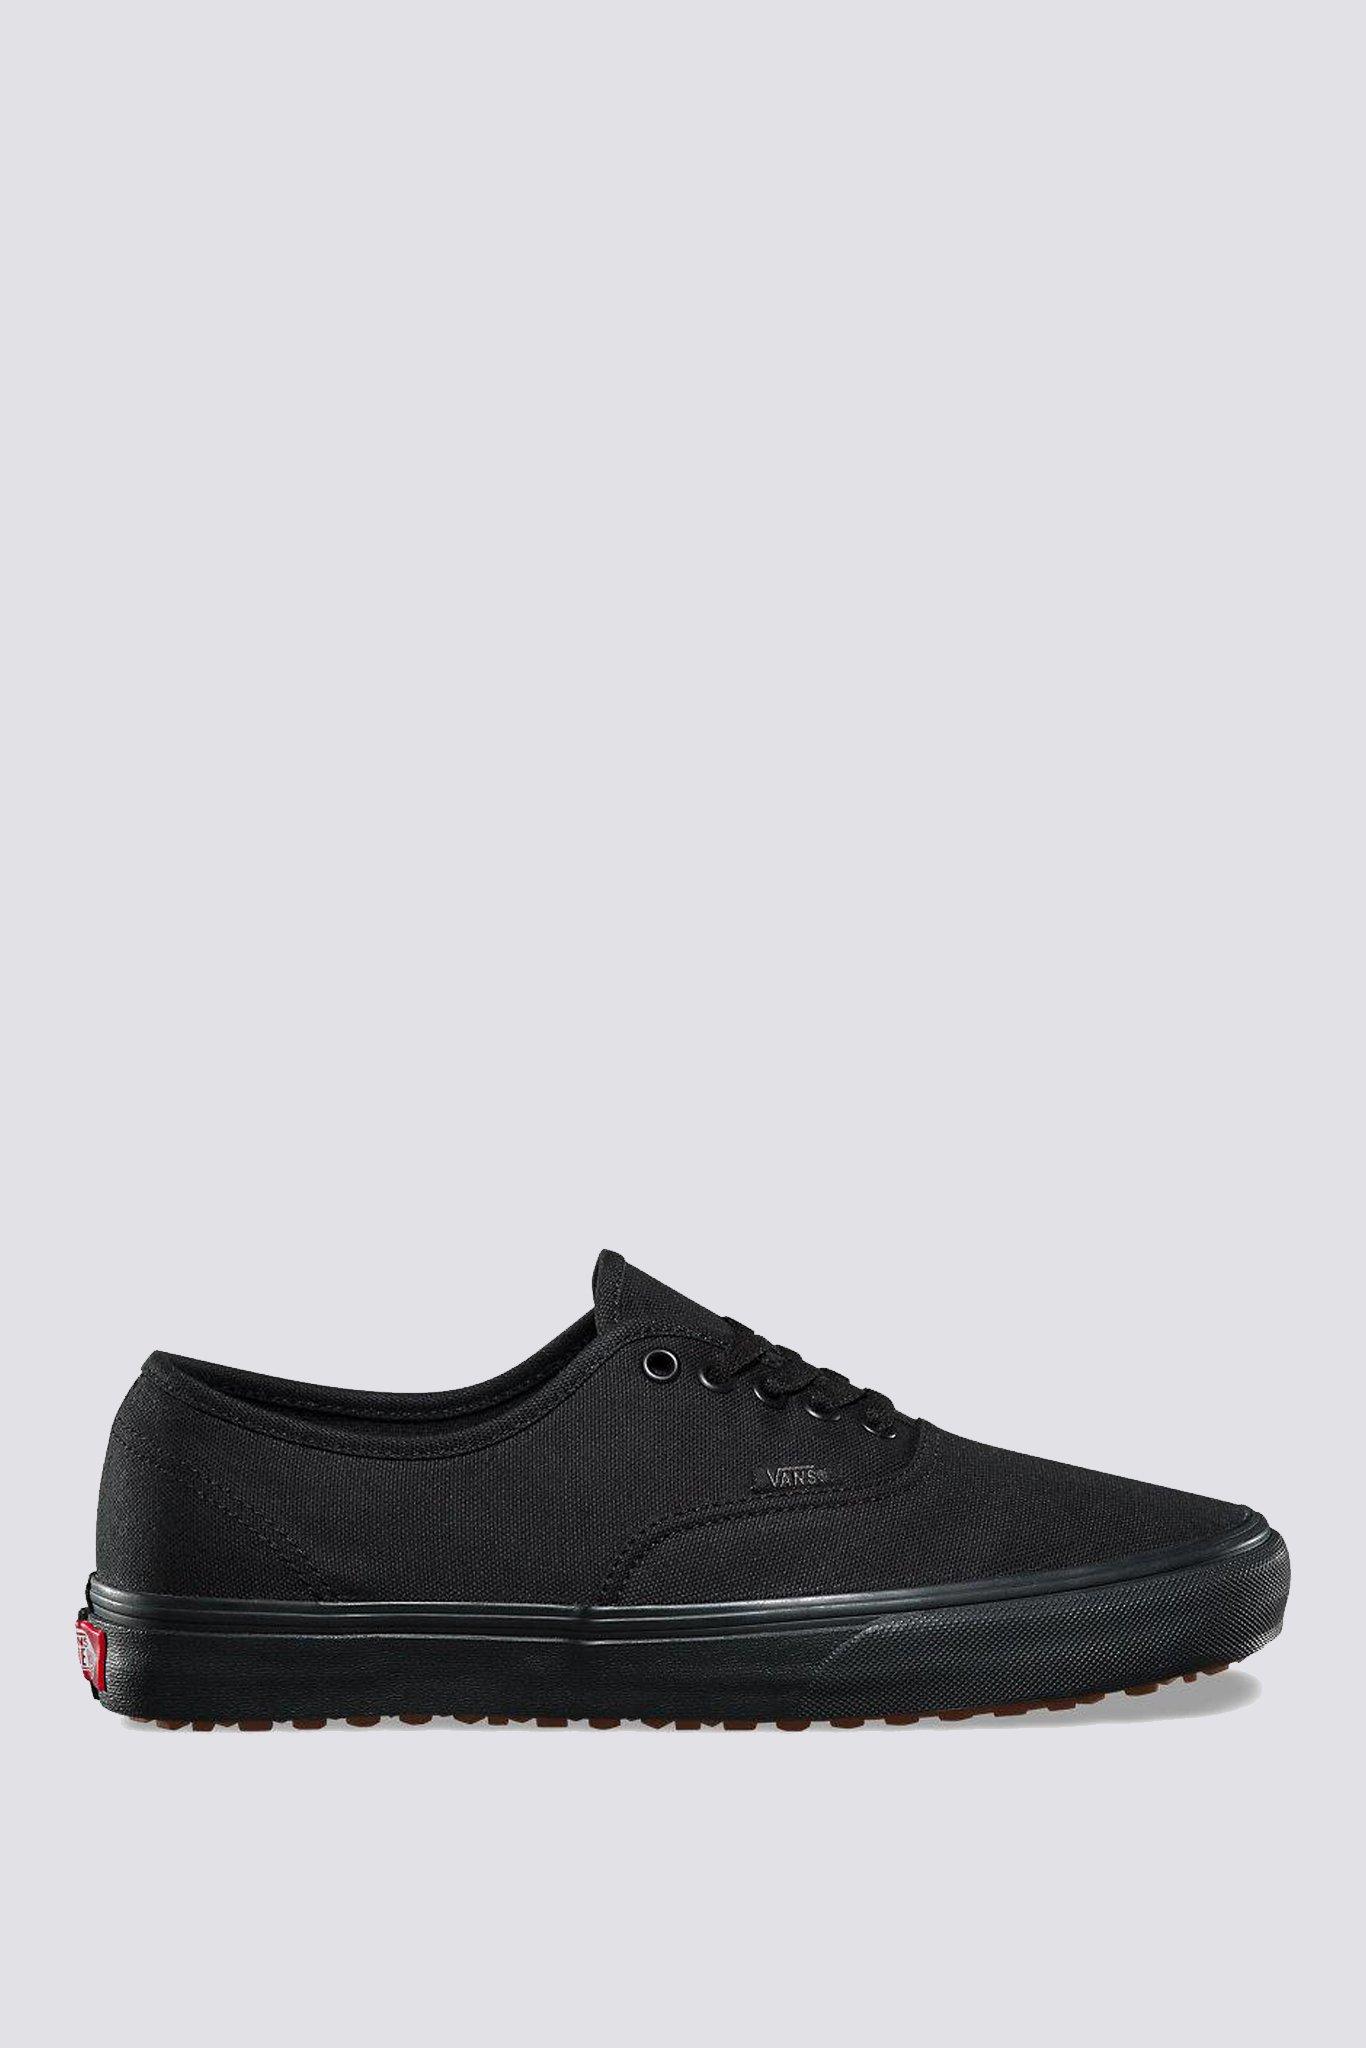 vans slip resistant shoes, OFF 77%,Best